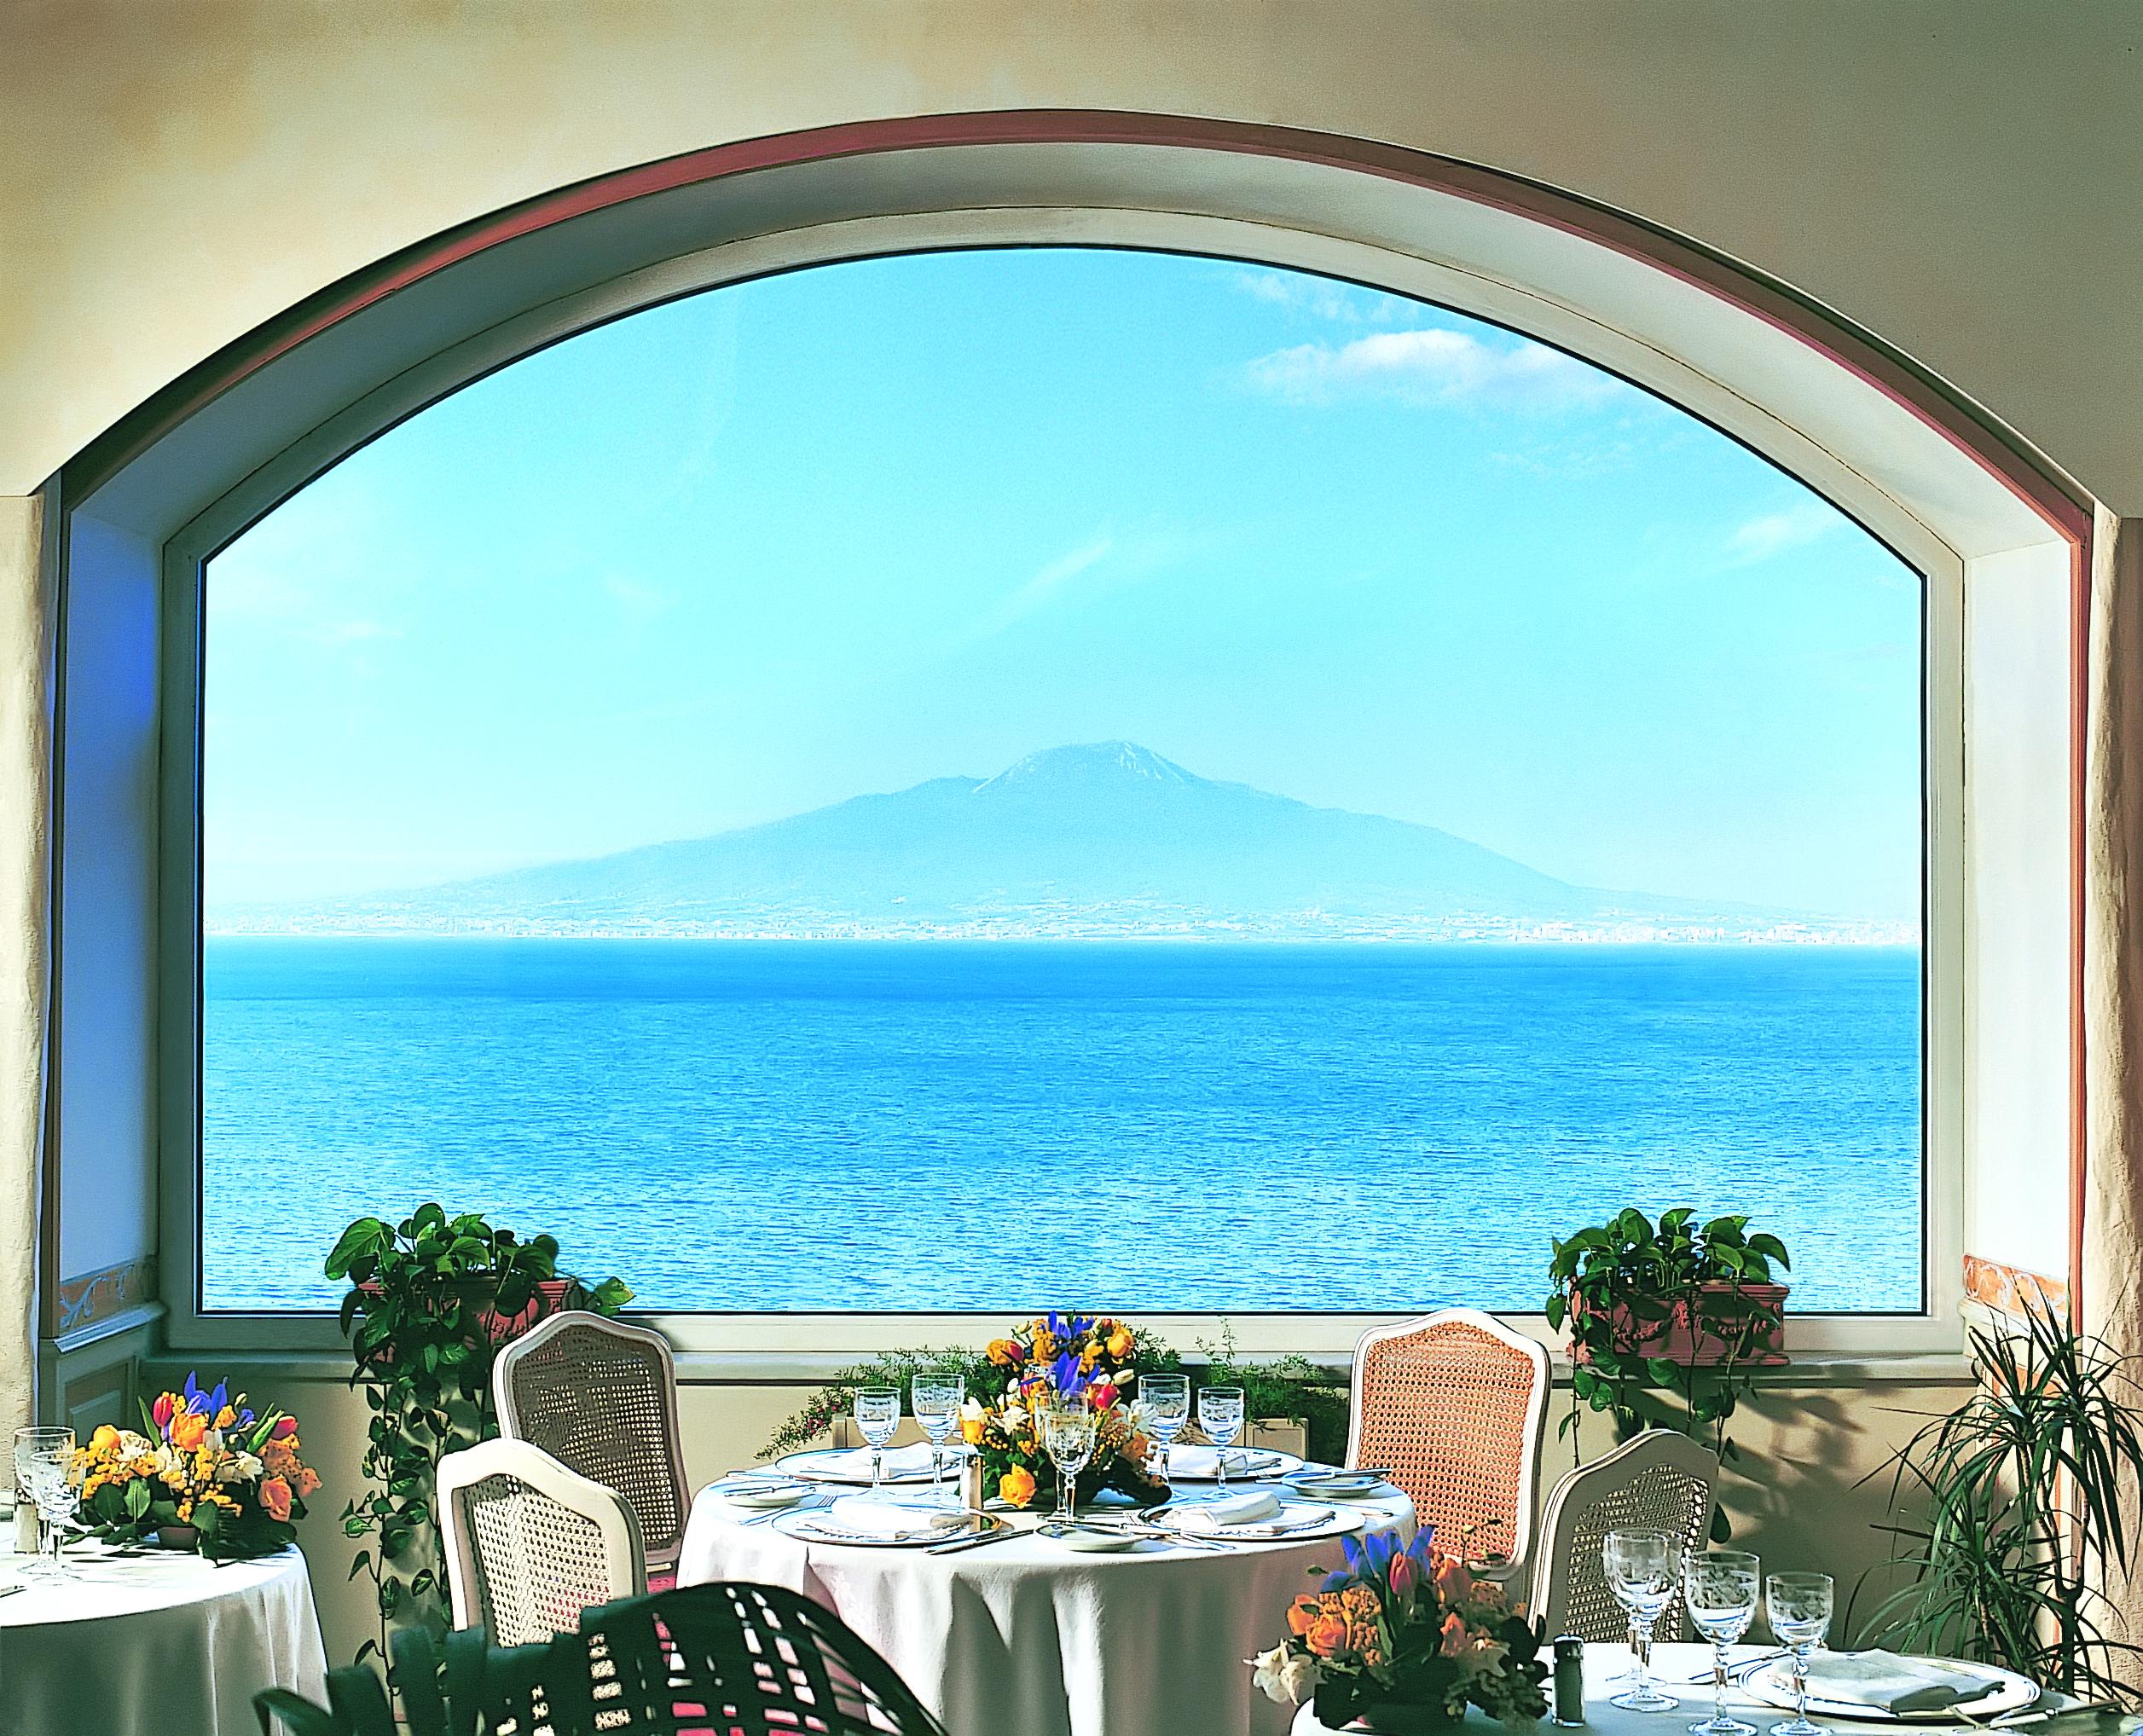 Grand Hotel Excelsior Vittoria Sorrento Bosquet Restaurant